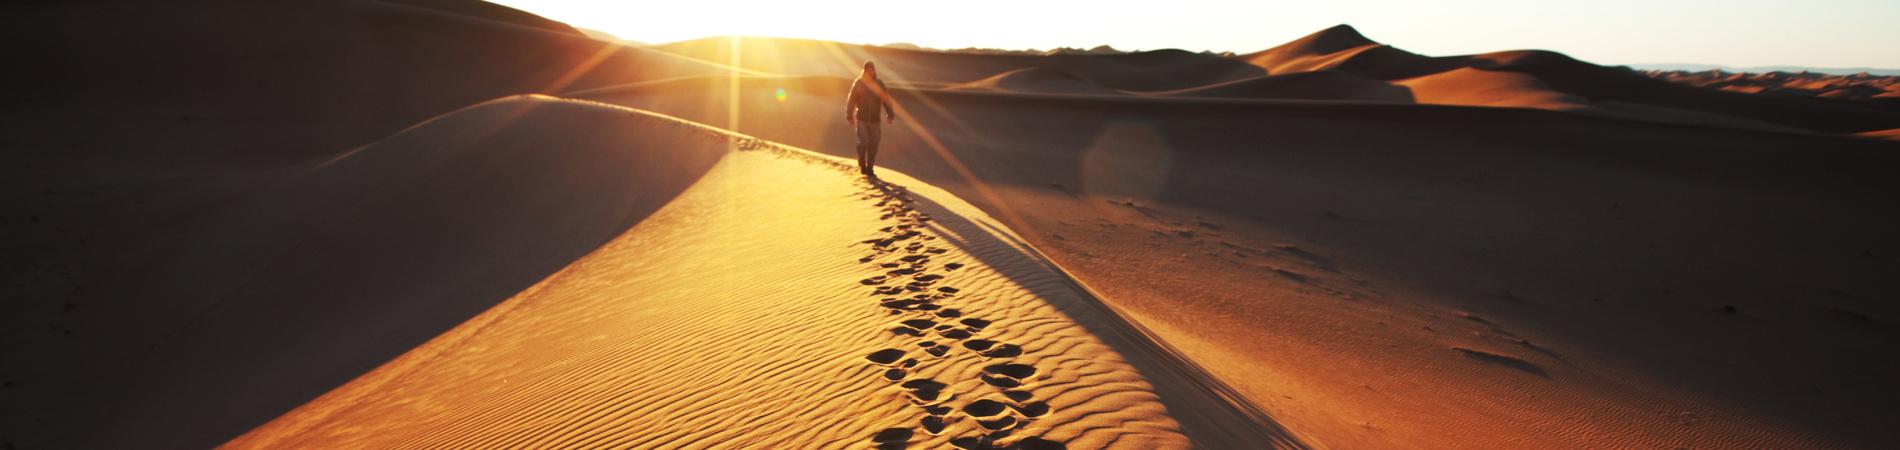 shutterstock nam dune walk header